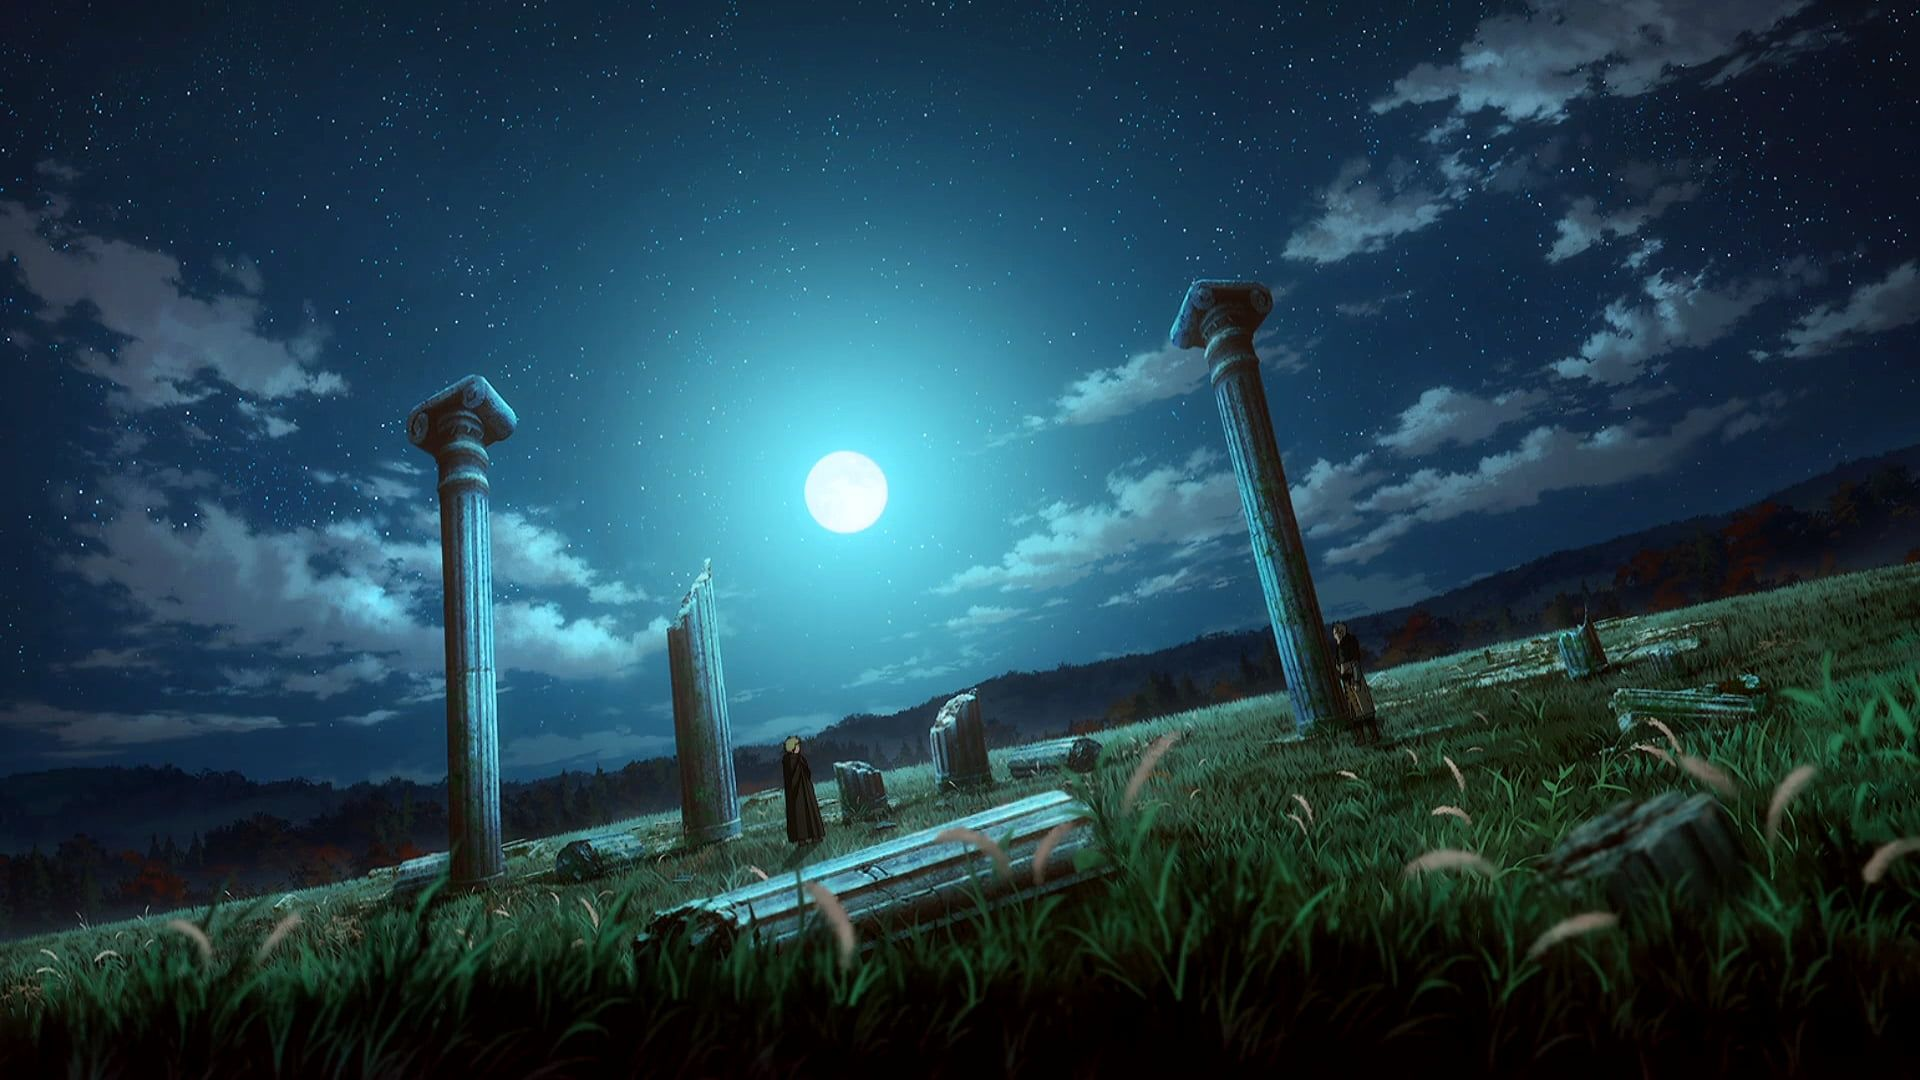 Vinland Saga Landscape Ruins Night Night Sky Moon Stars Clouds Roman Empire England Anime Manga Trees Grass Makoto Yukimura Wit Studio Thorfinn Em 2020 1080p